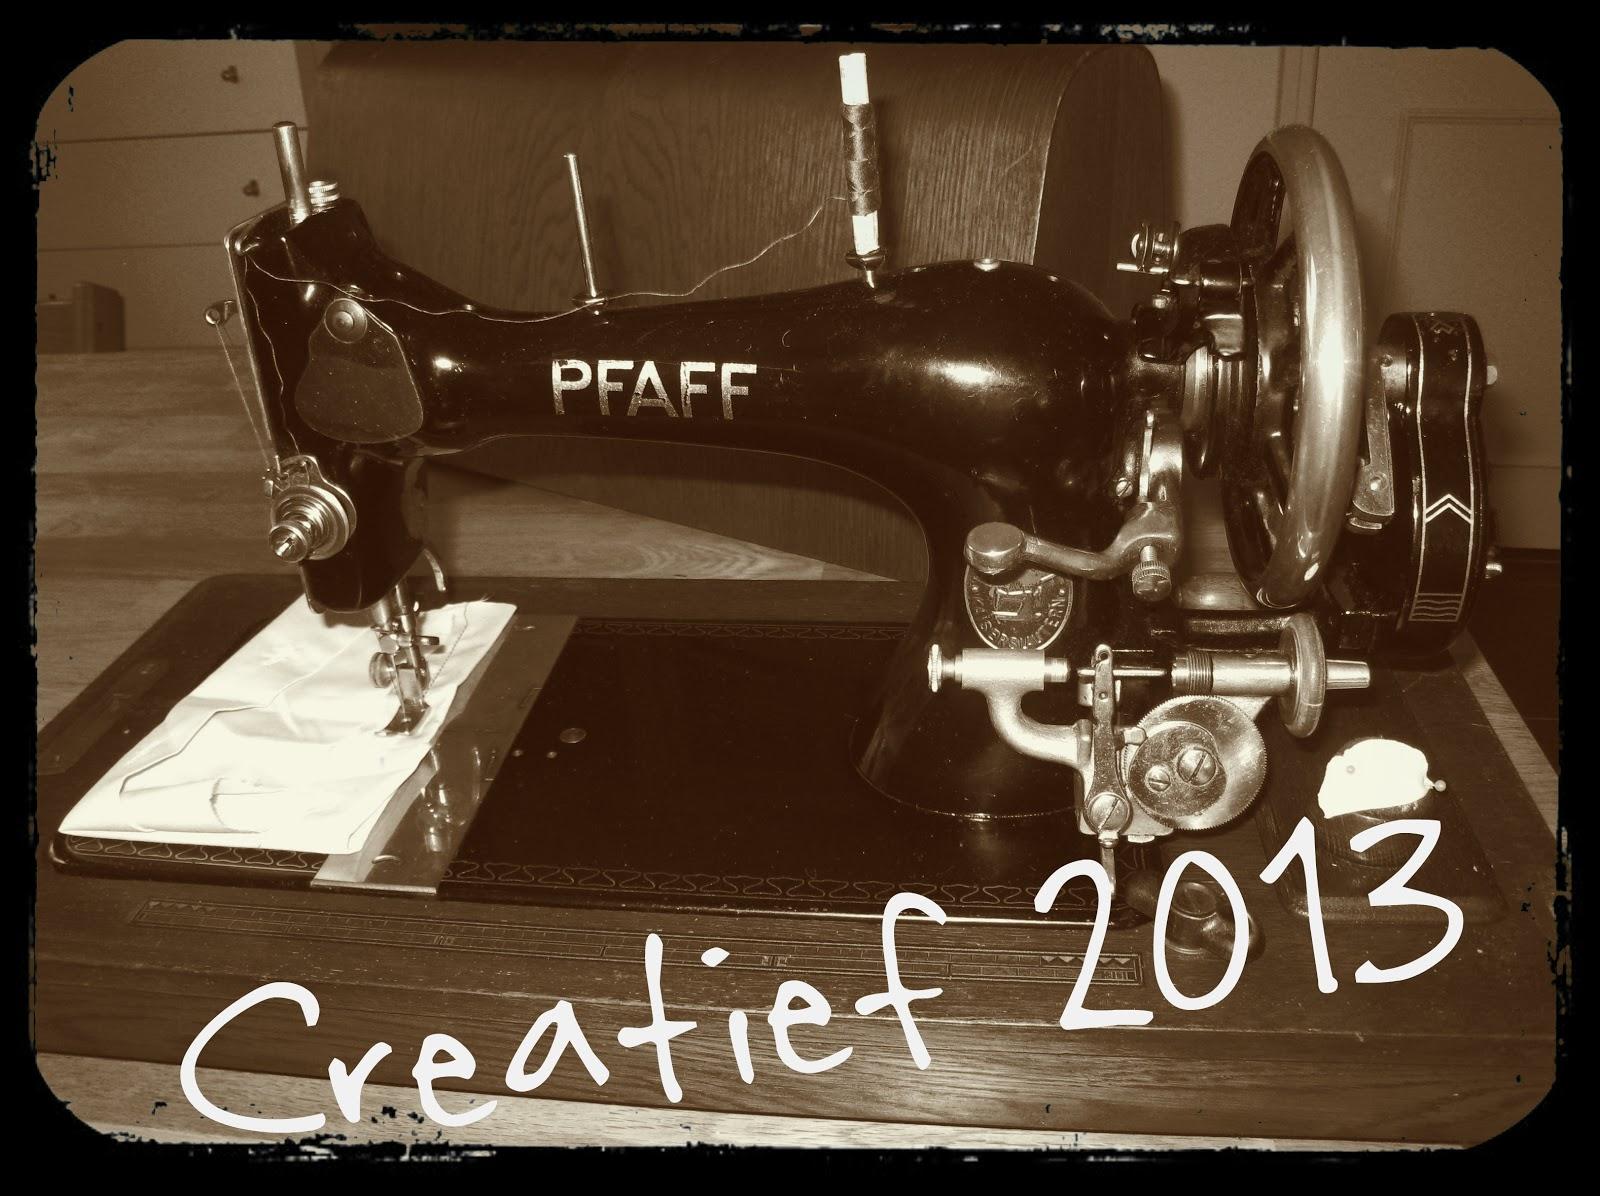 Oude Pfaff naaimachine, creatief 2013